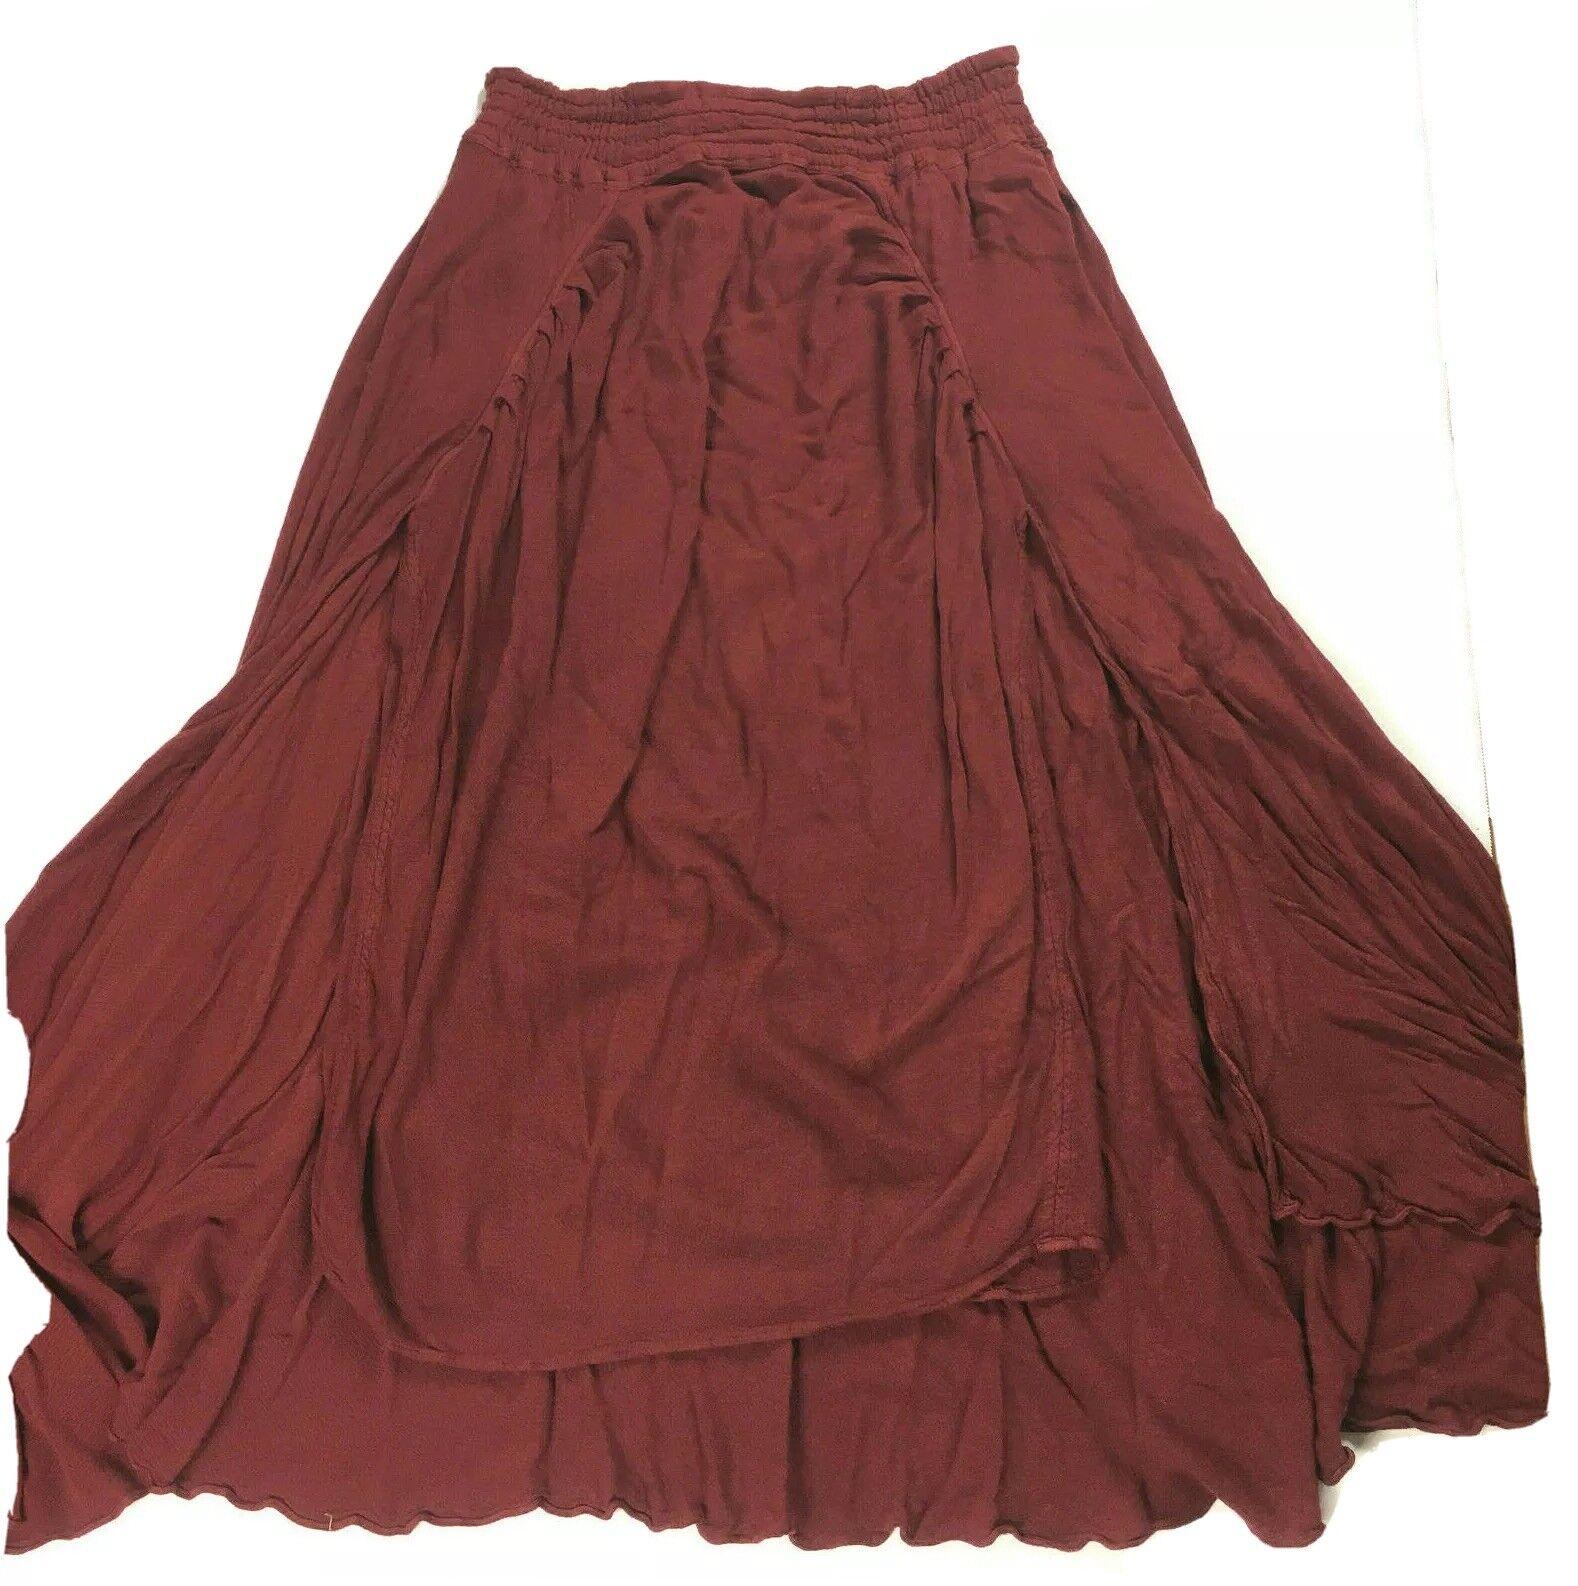 Laise Adzer Skirt Women's Small Medium Large Lage… - image 1